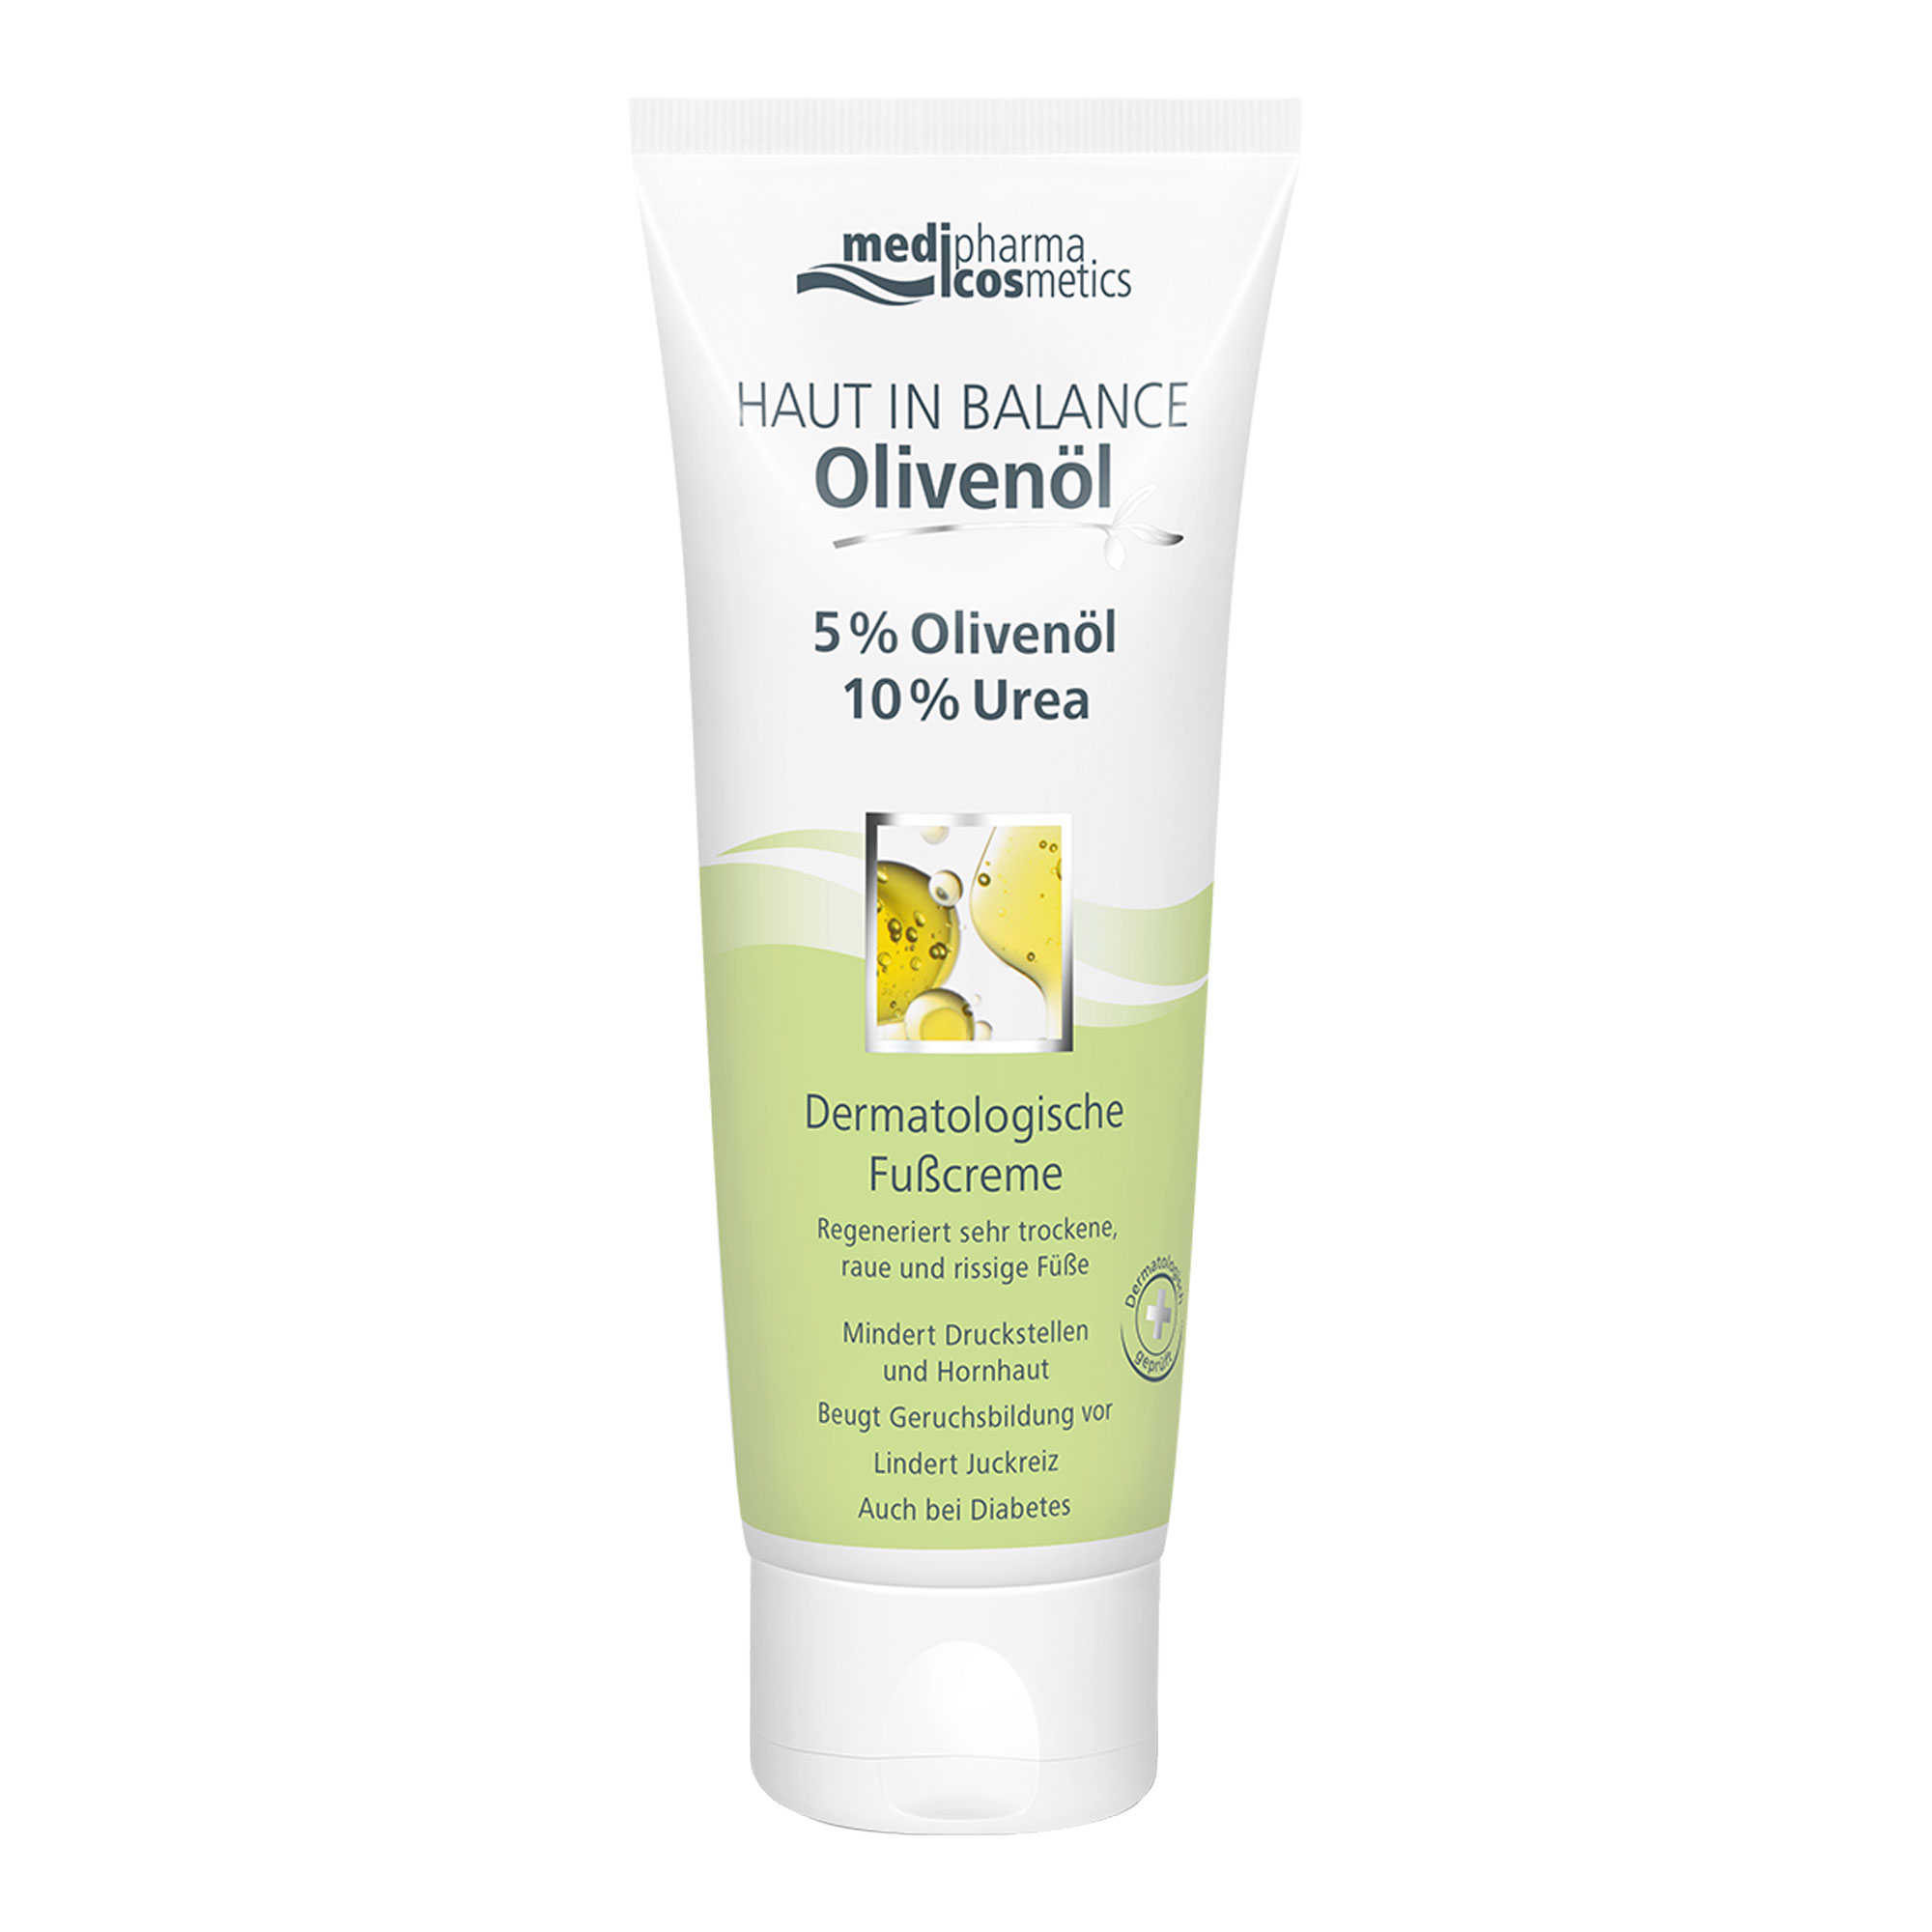 Olivenöl Haut in Balance Fußcreme